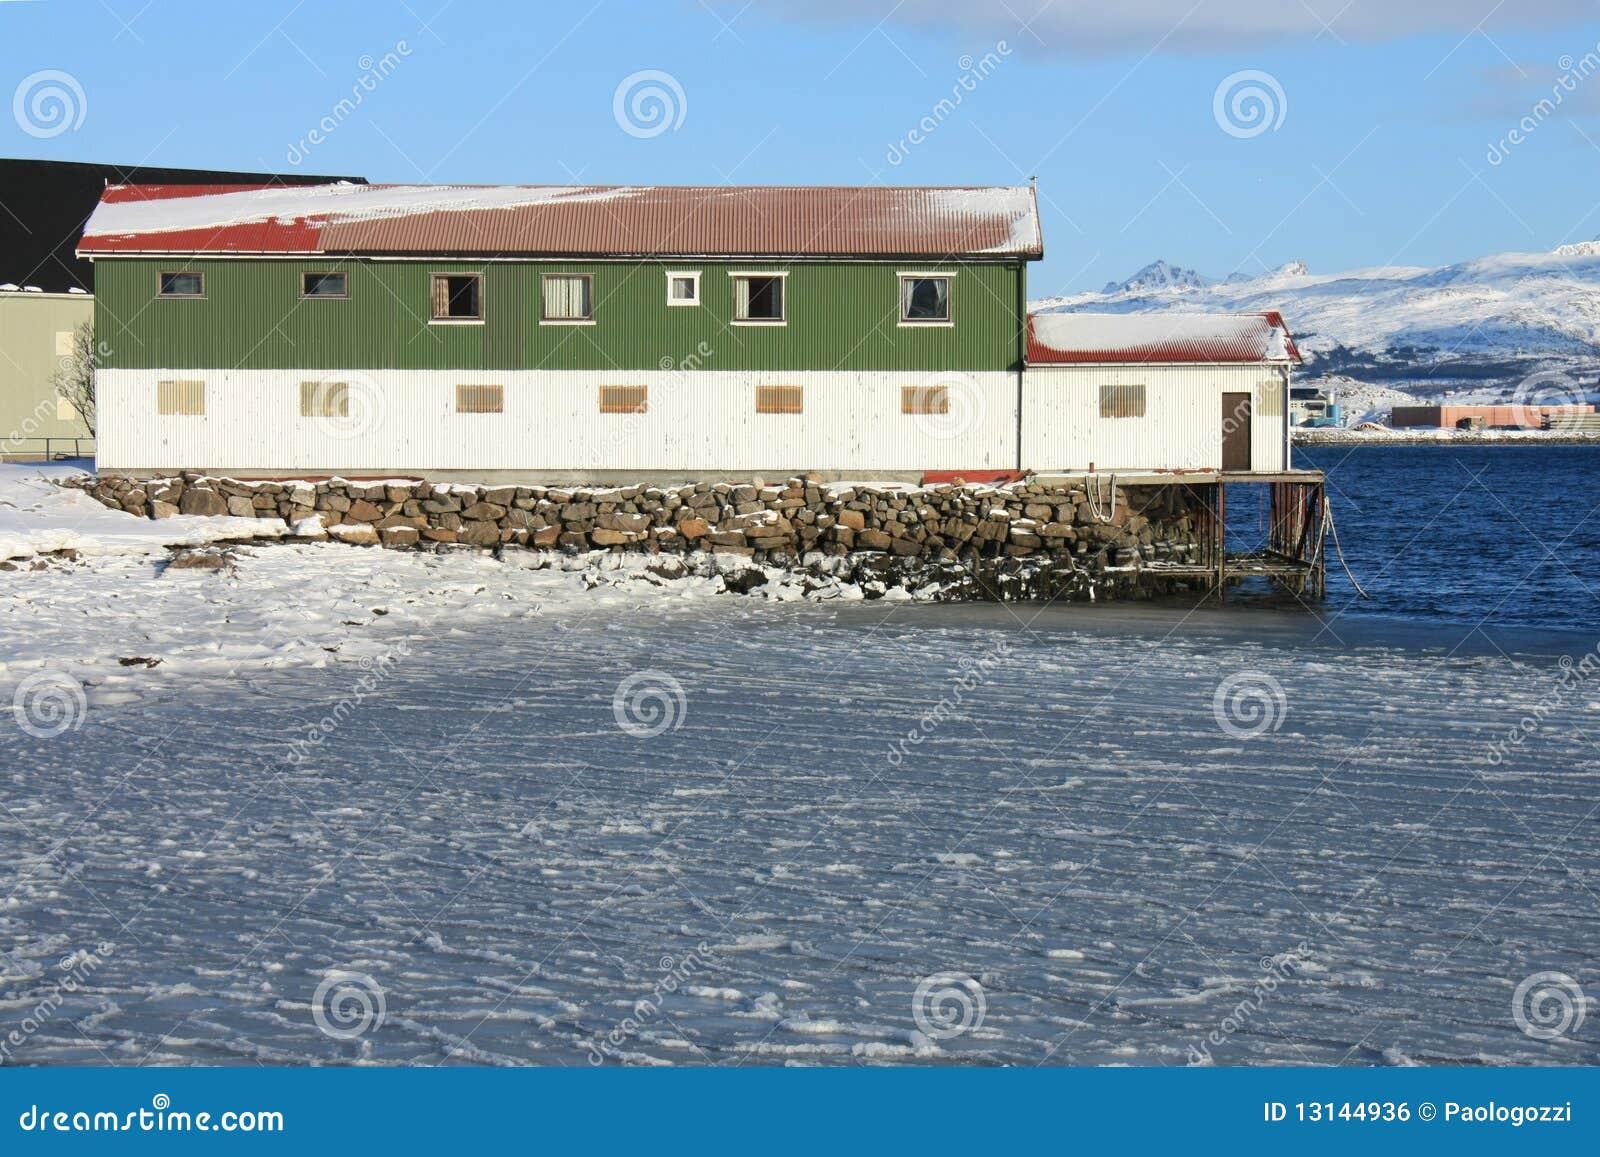 Icy sea & factory